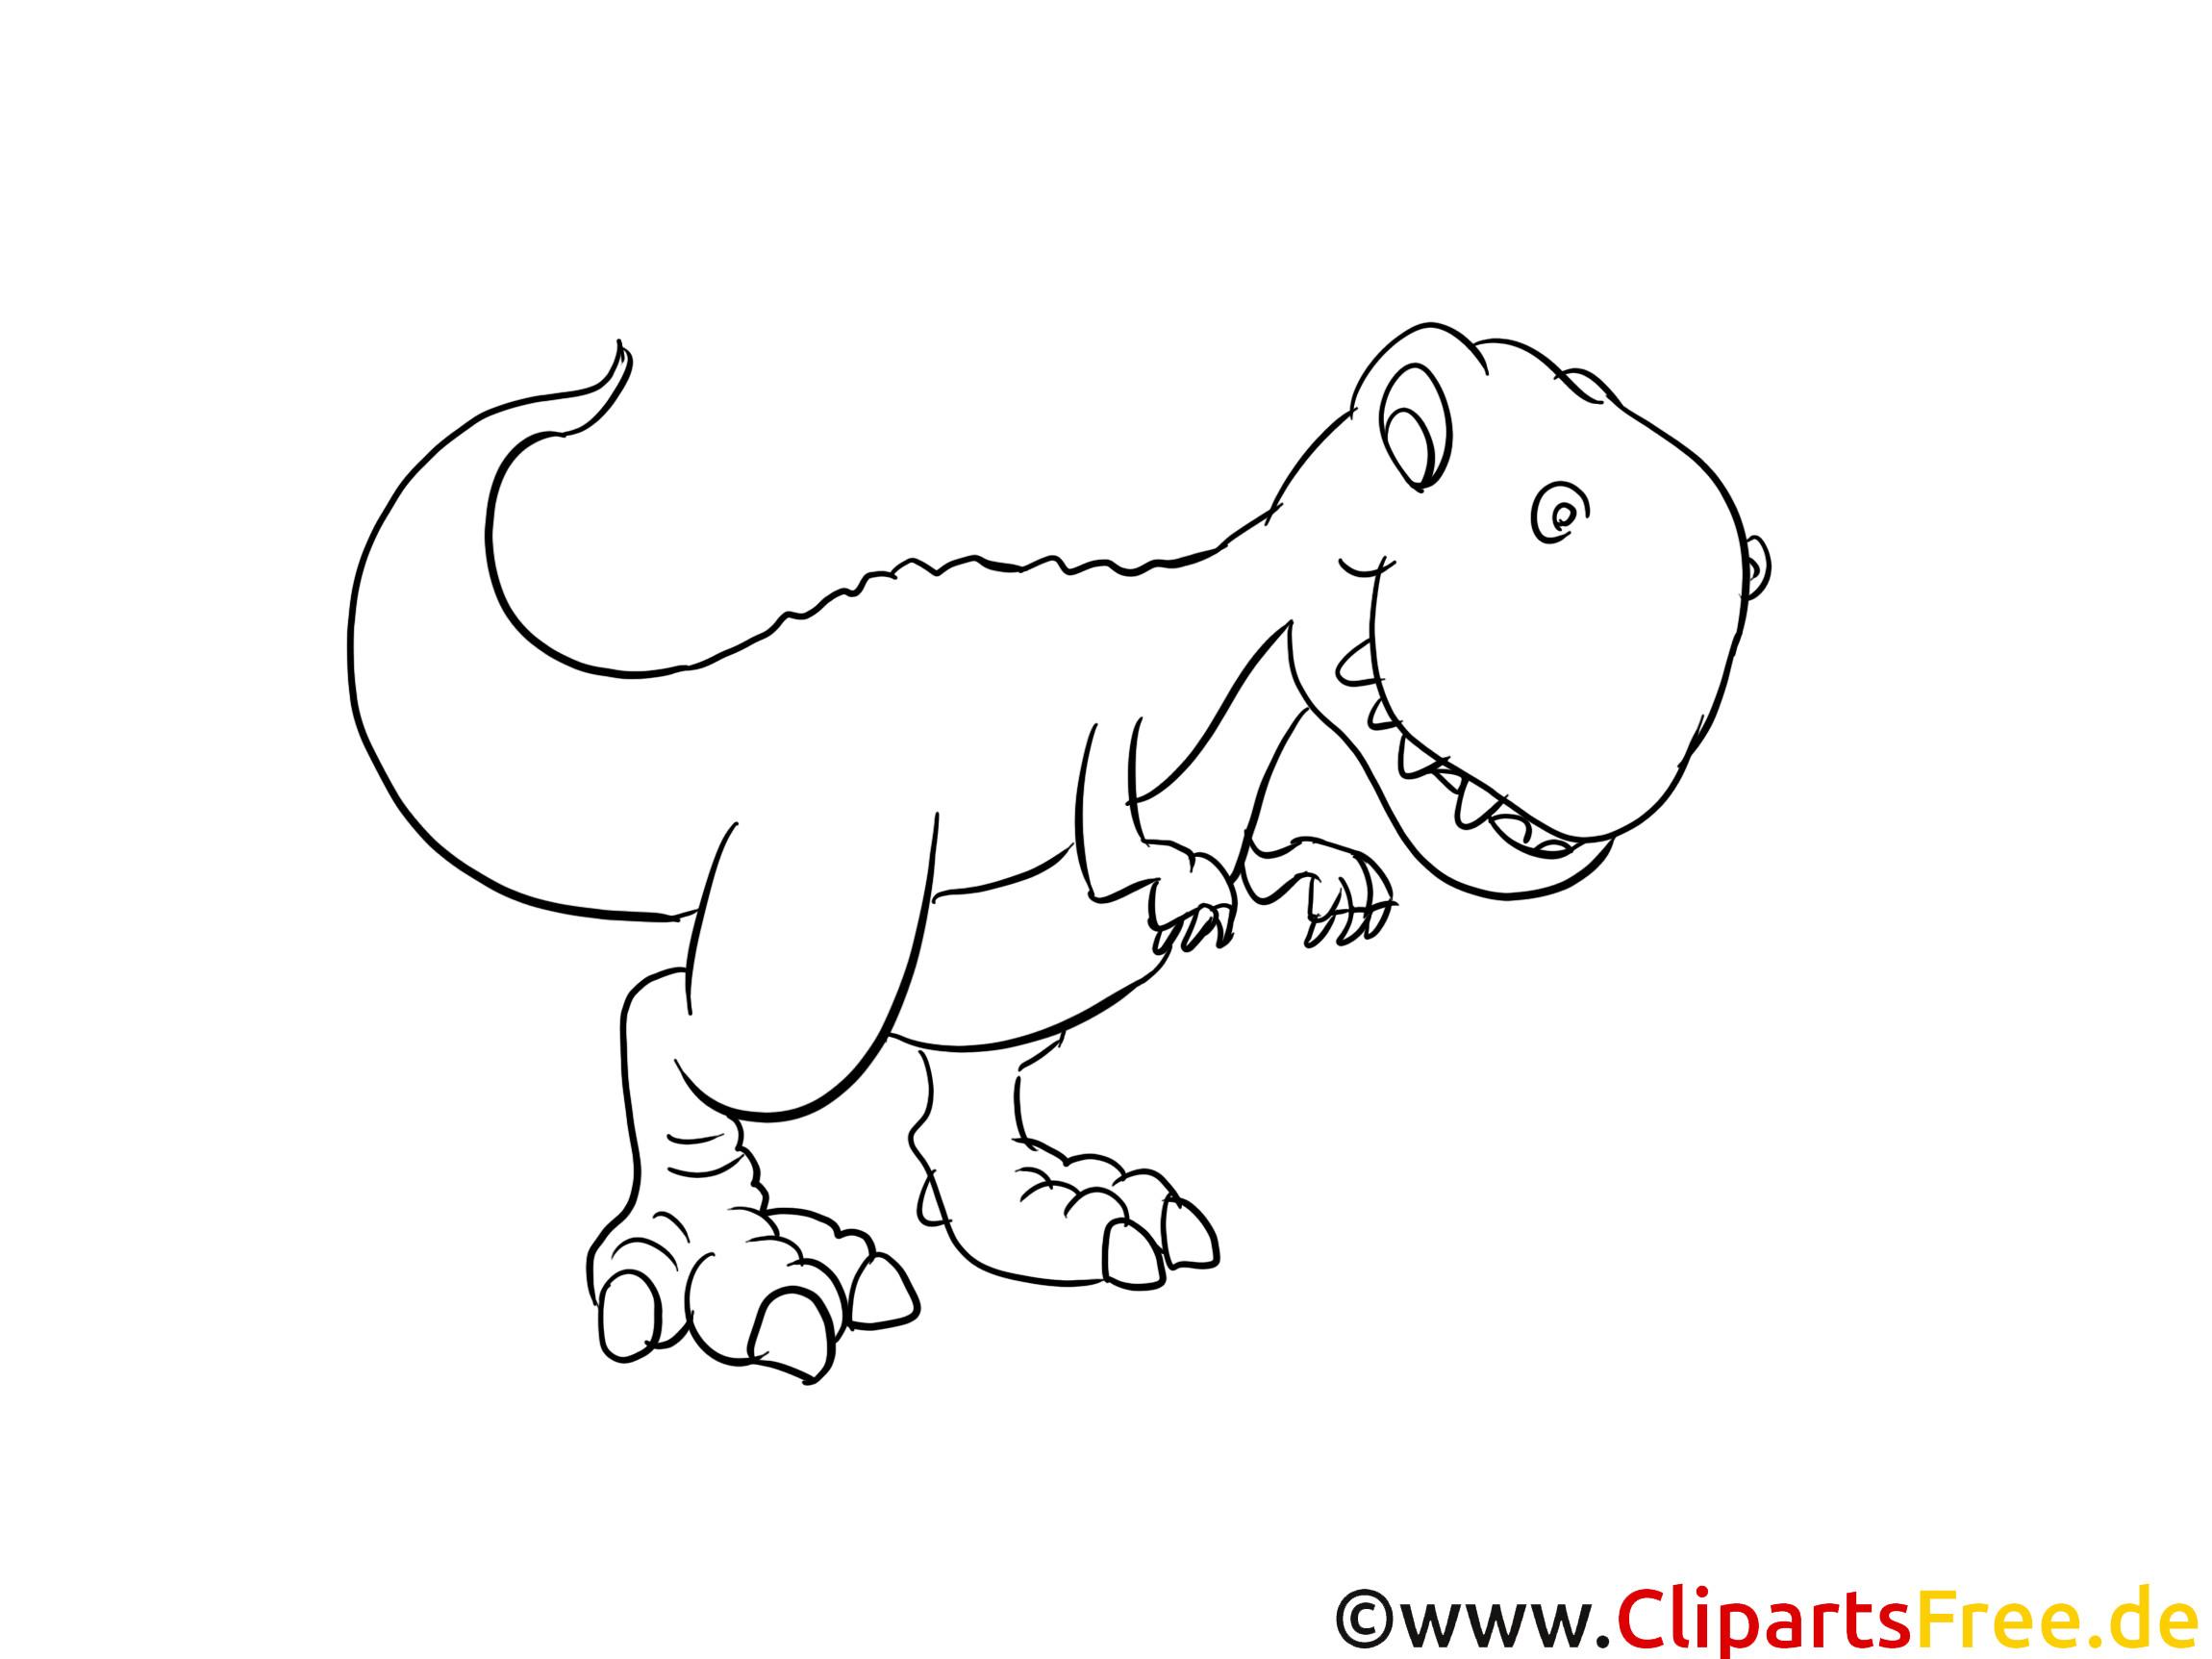 Tyrannosaurus Rex Ausmalbilder  Rex Dinosaurier Ausmalbild